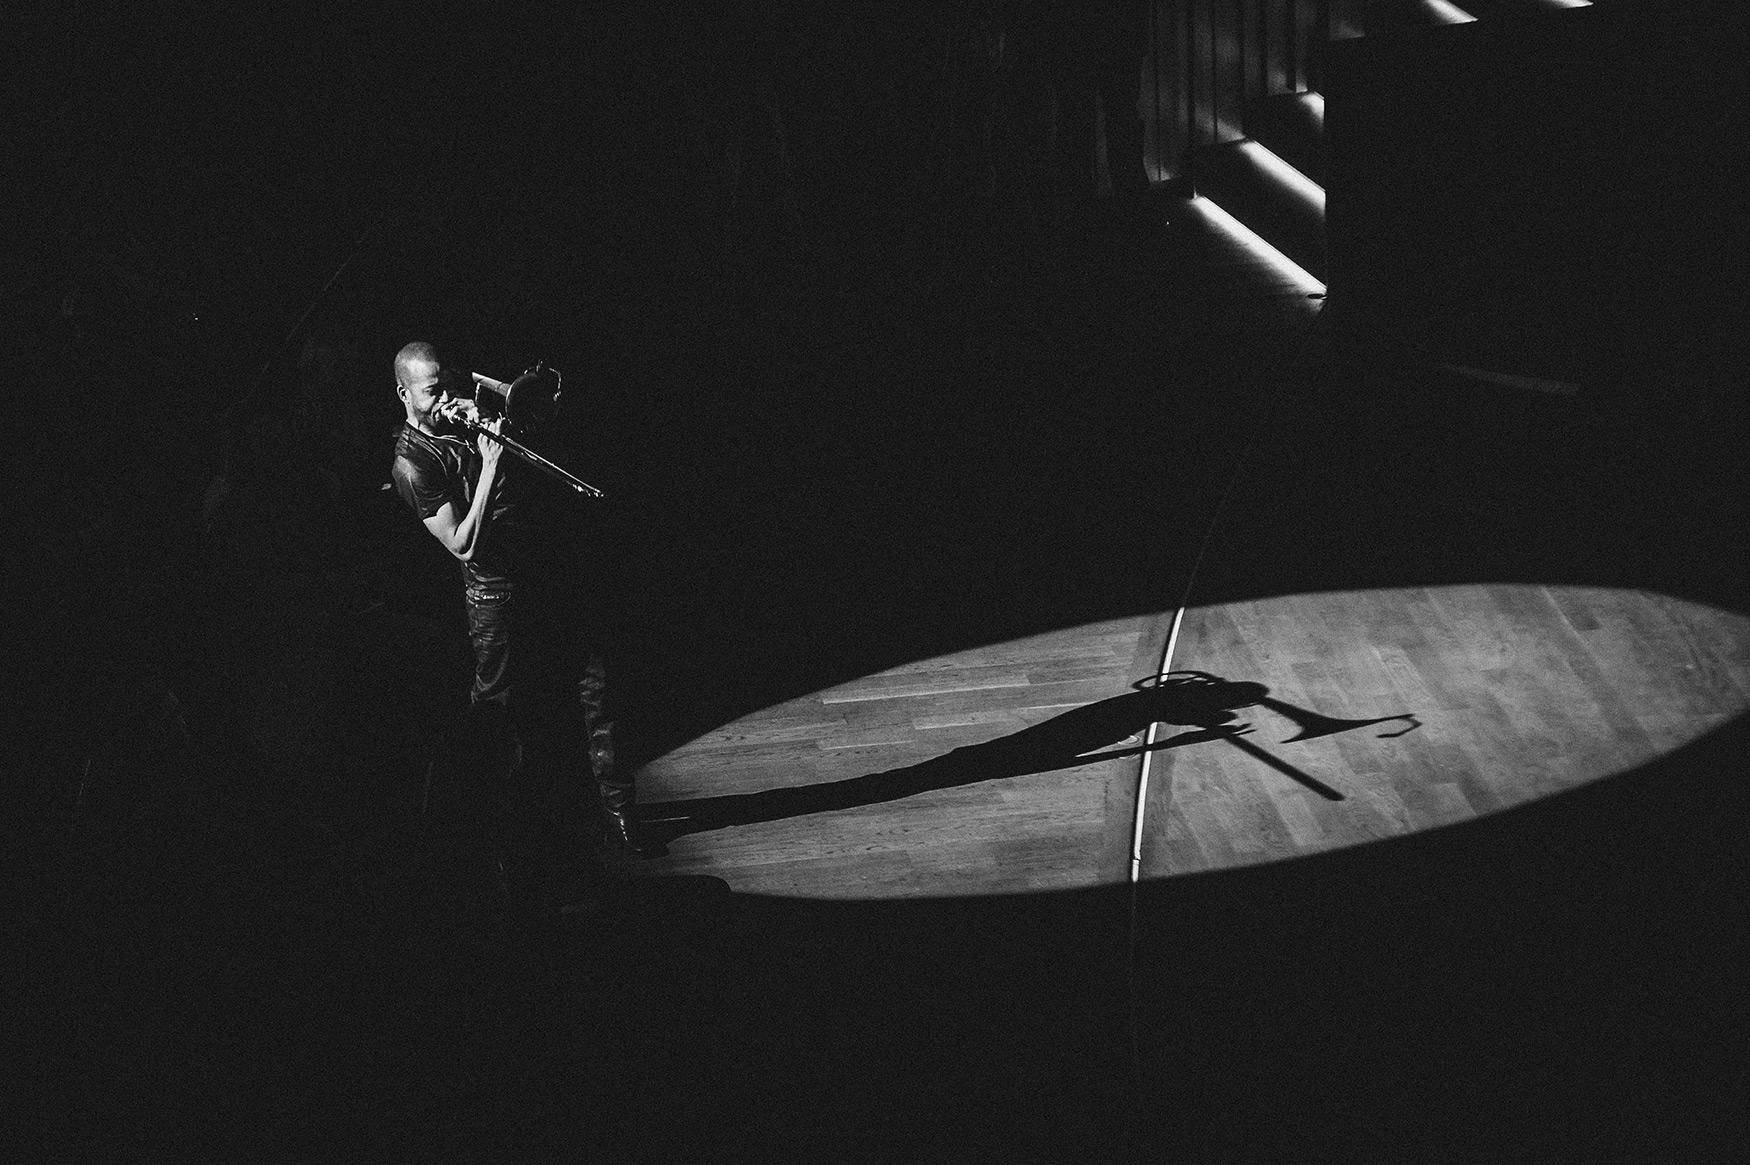 Fot. Piotr Banasik